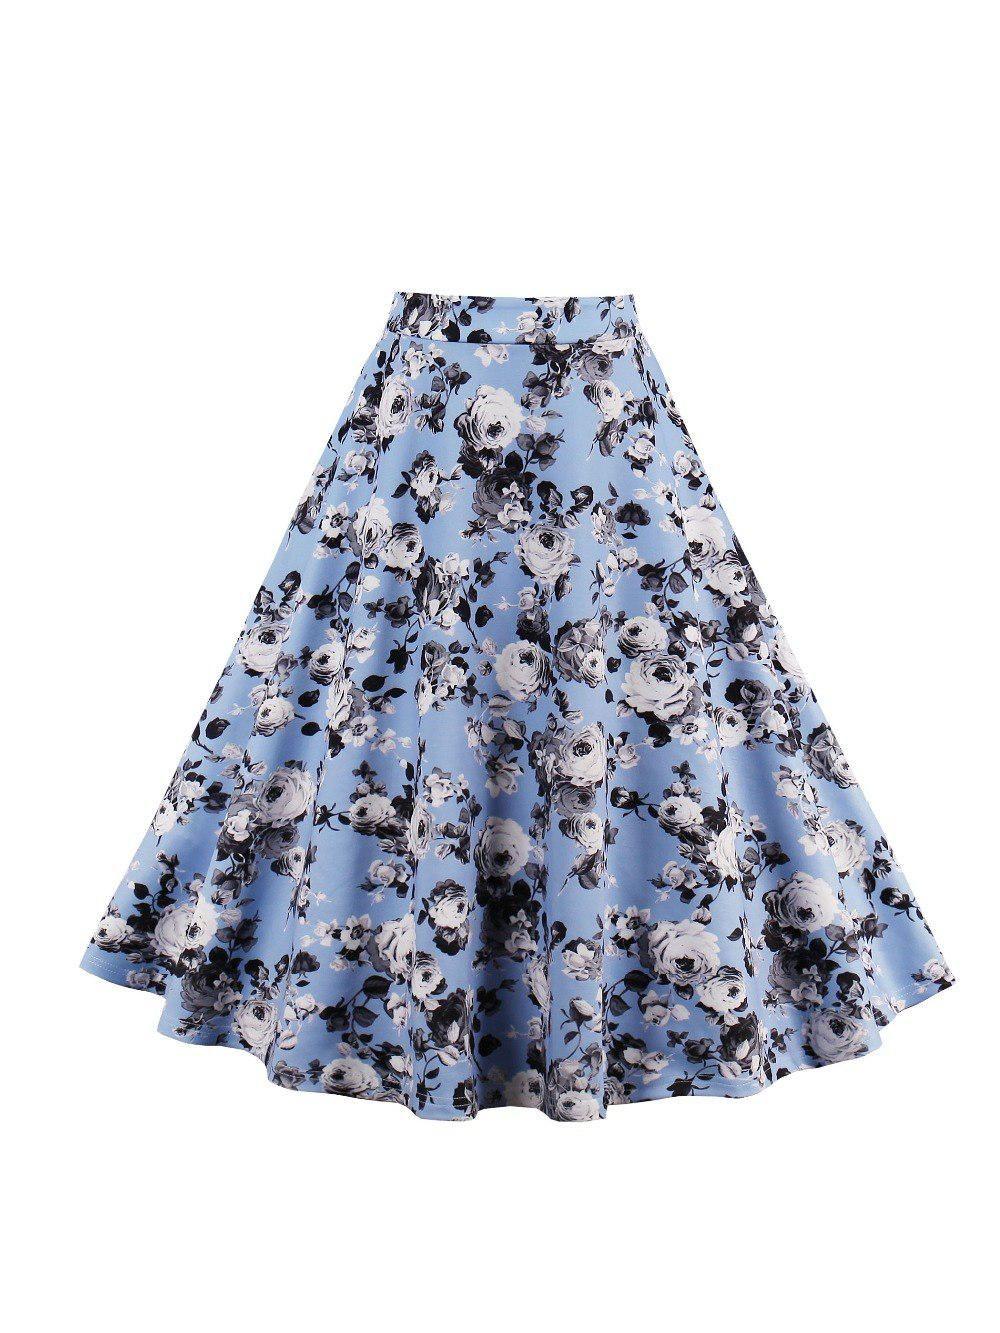 9b535615d9d6b Sisjuly Women Skirt Summer Print Blue Vintage Casual Girls Skirts ...